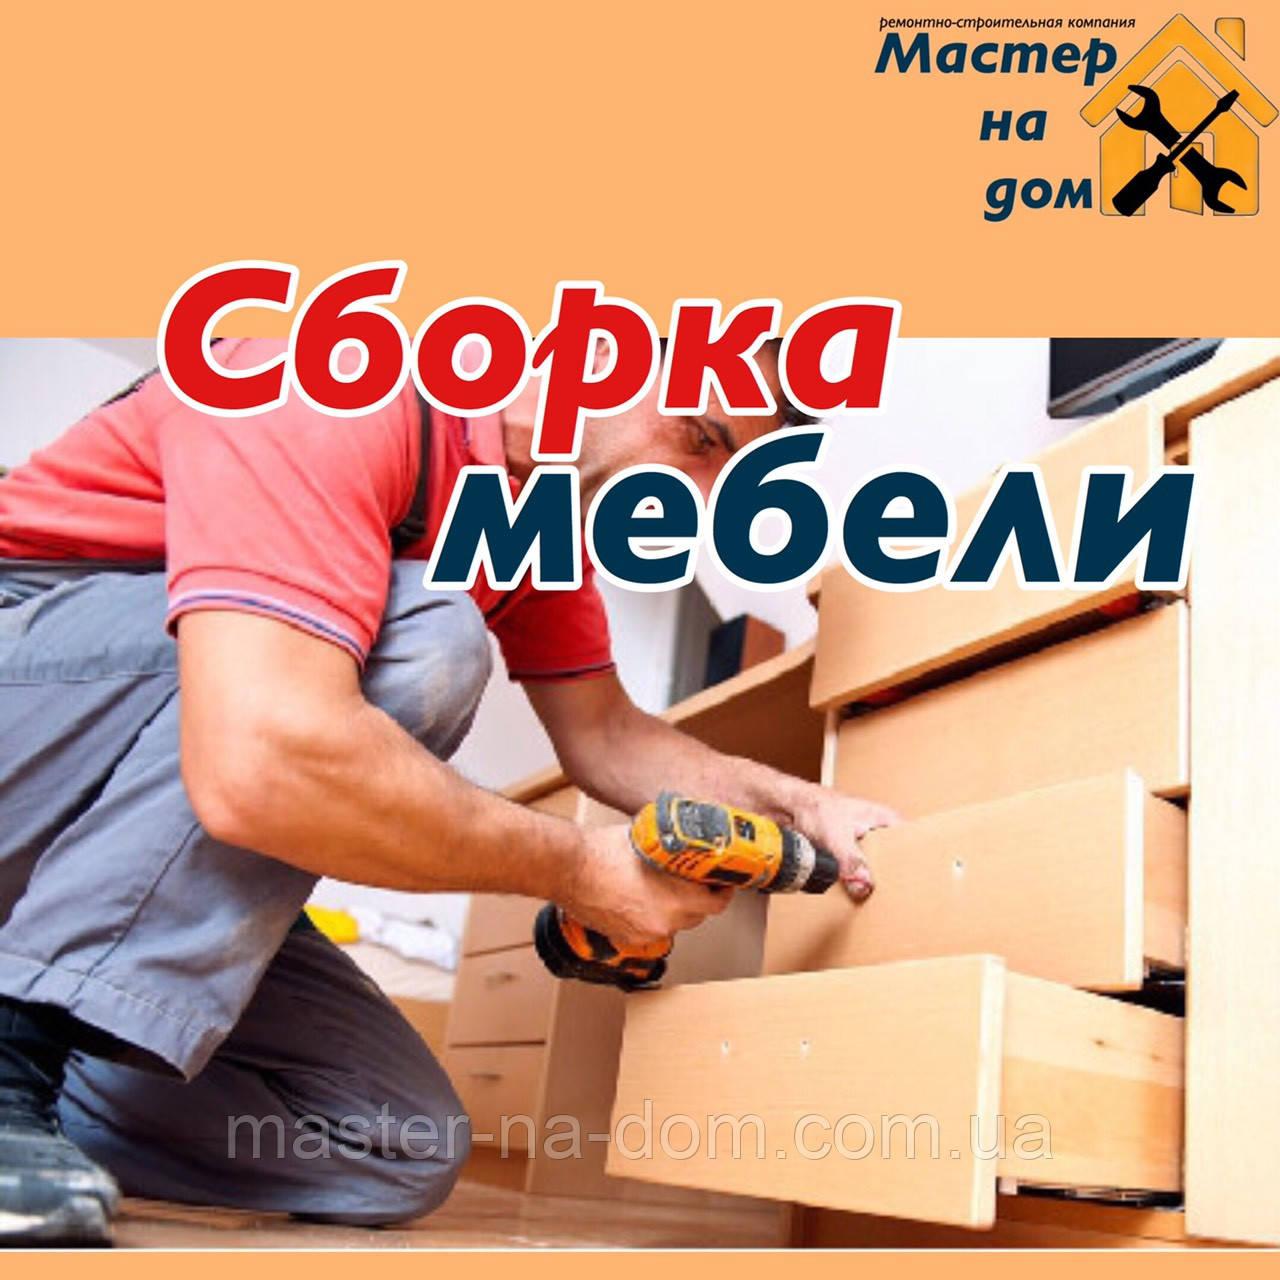 Сборка мебели в Днепре